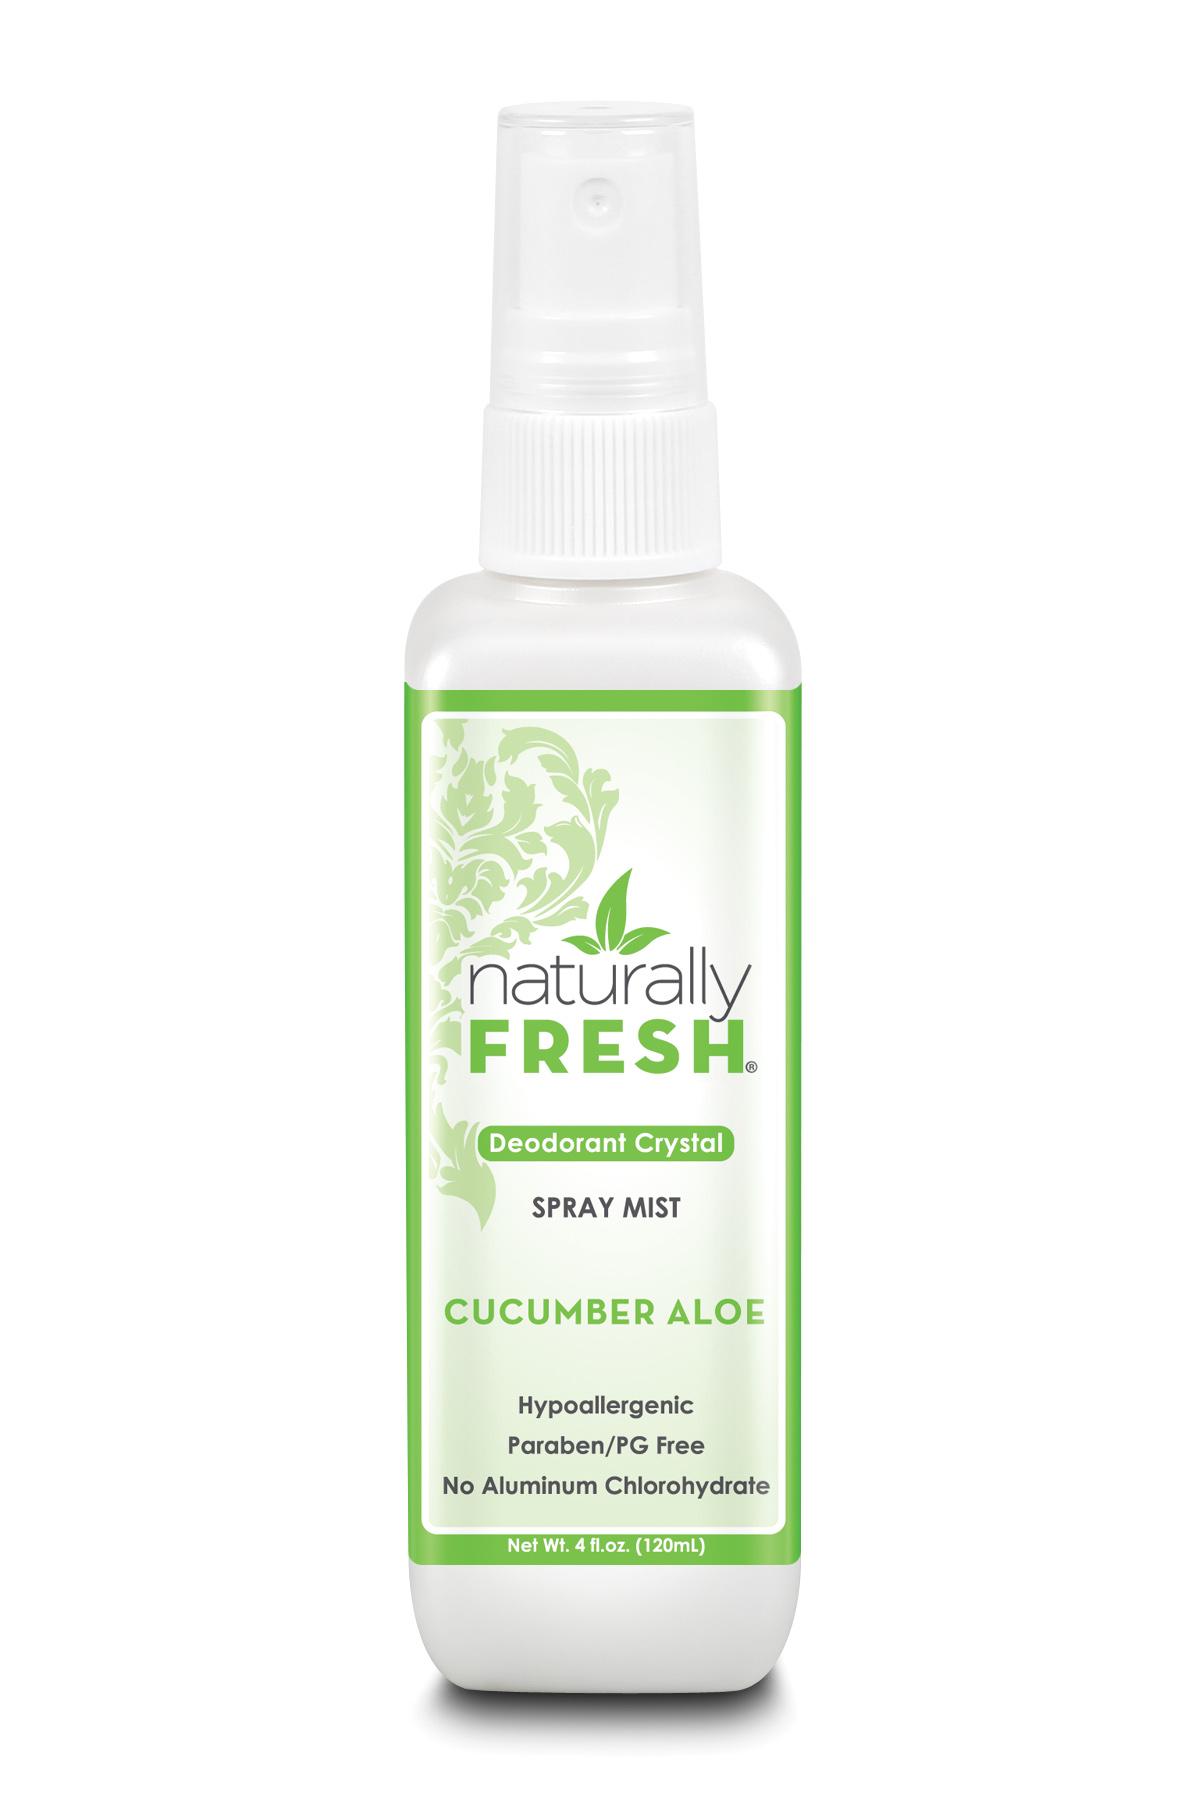 Deodorant Crystal Spray Mist Cucumber Aloe 120ml